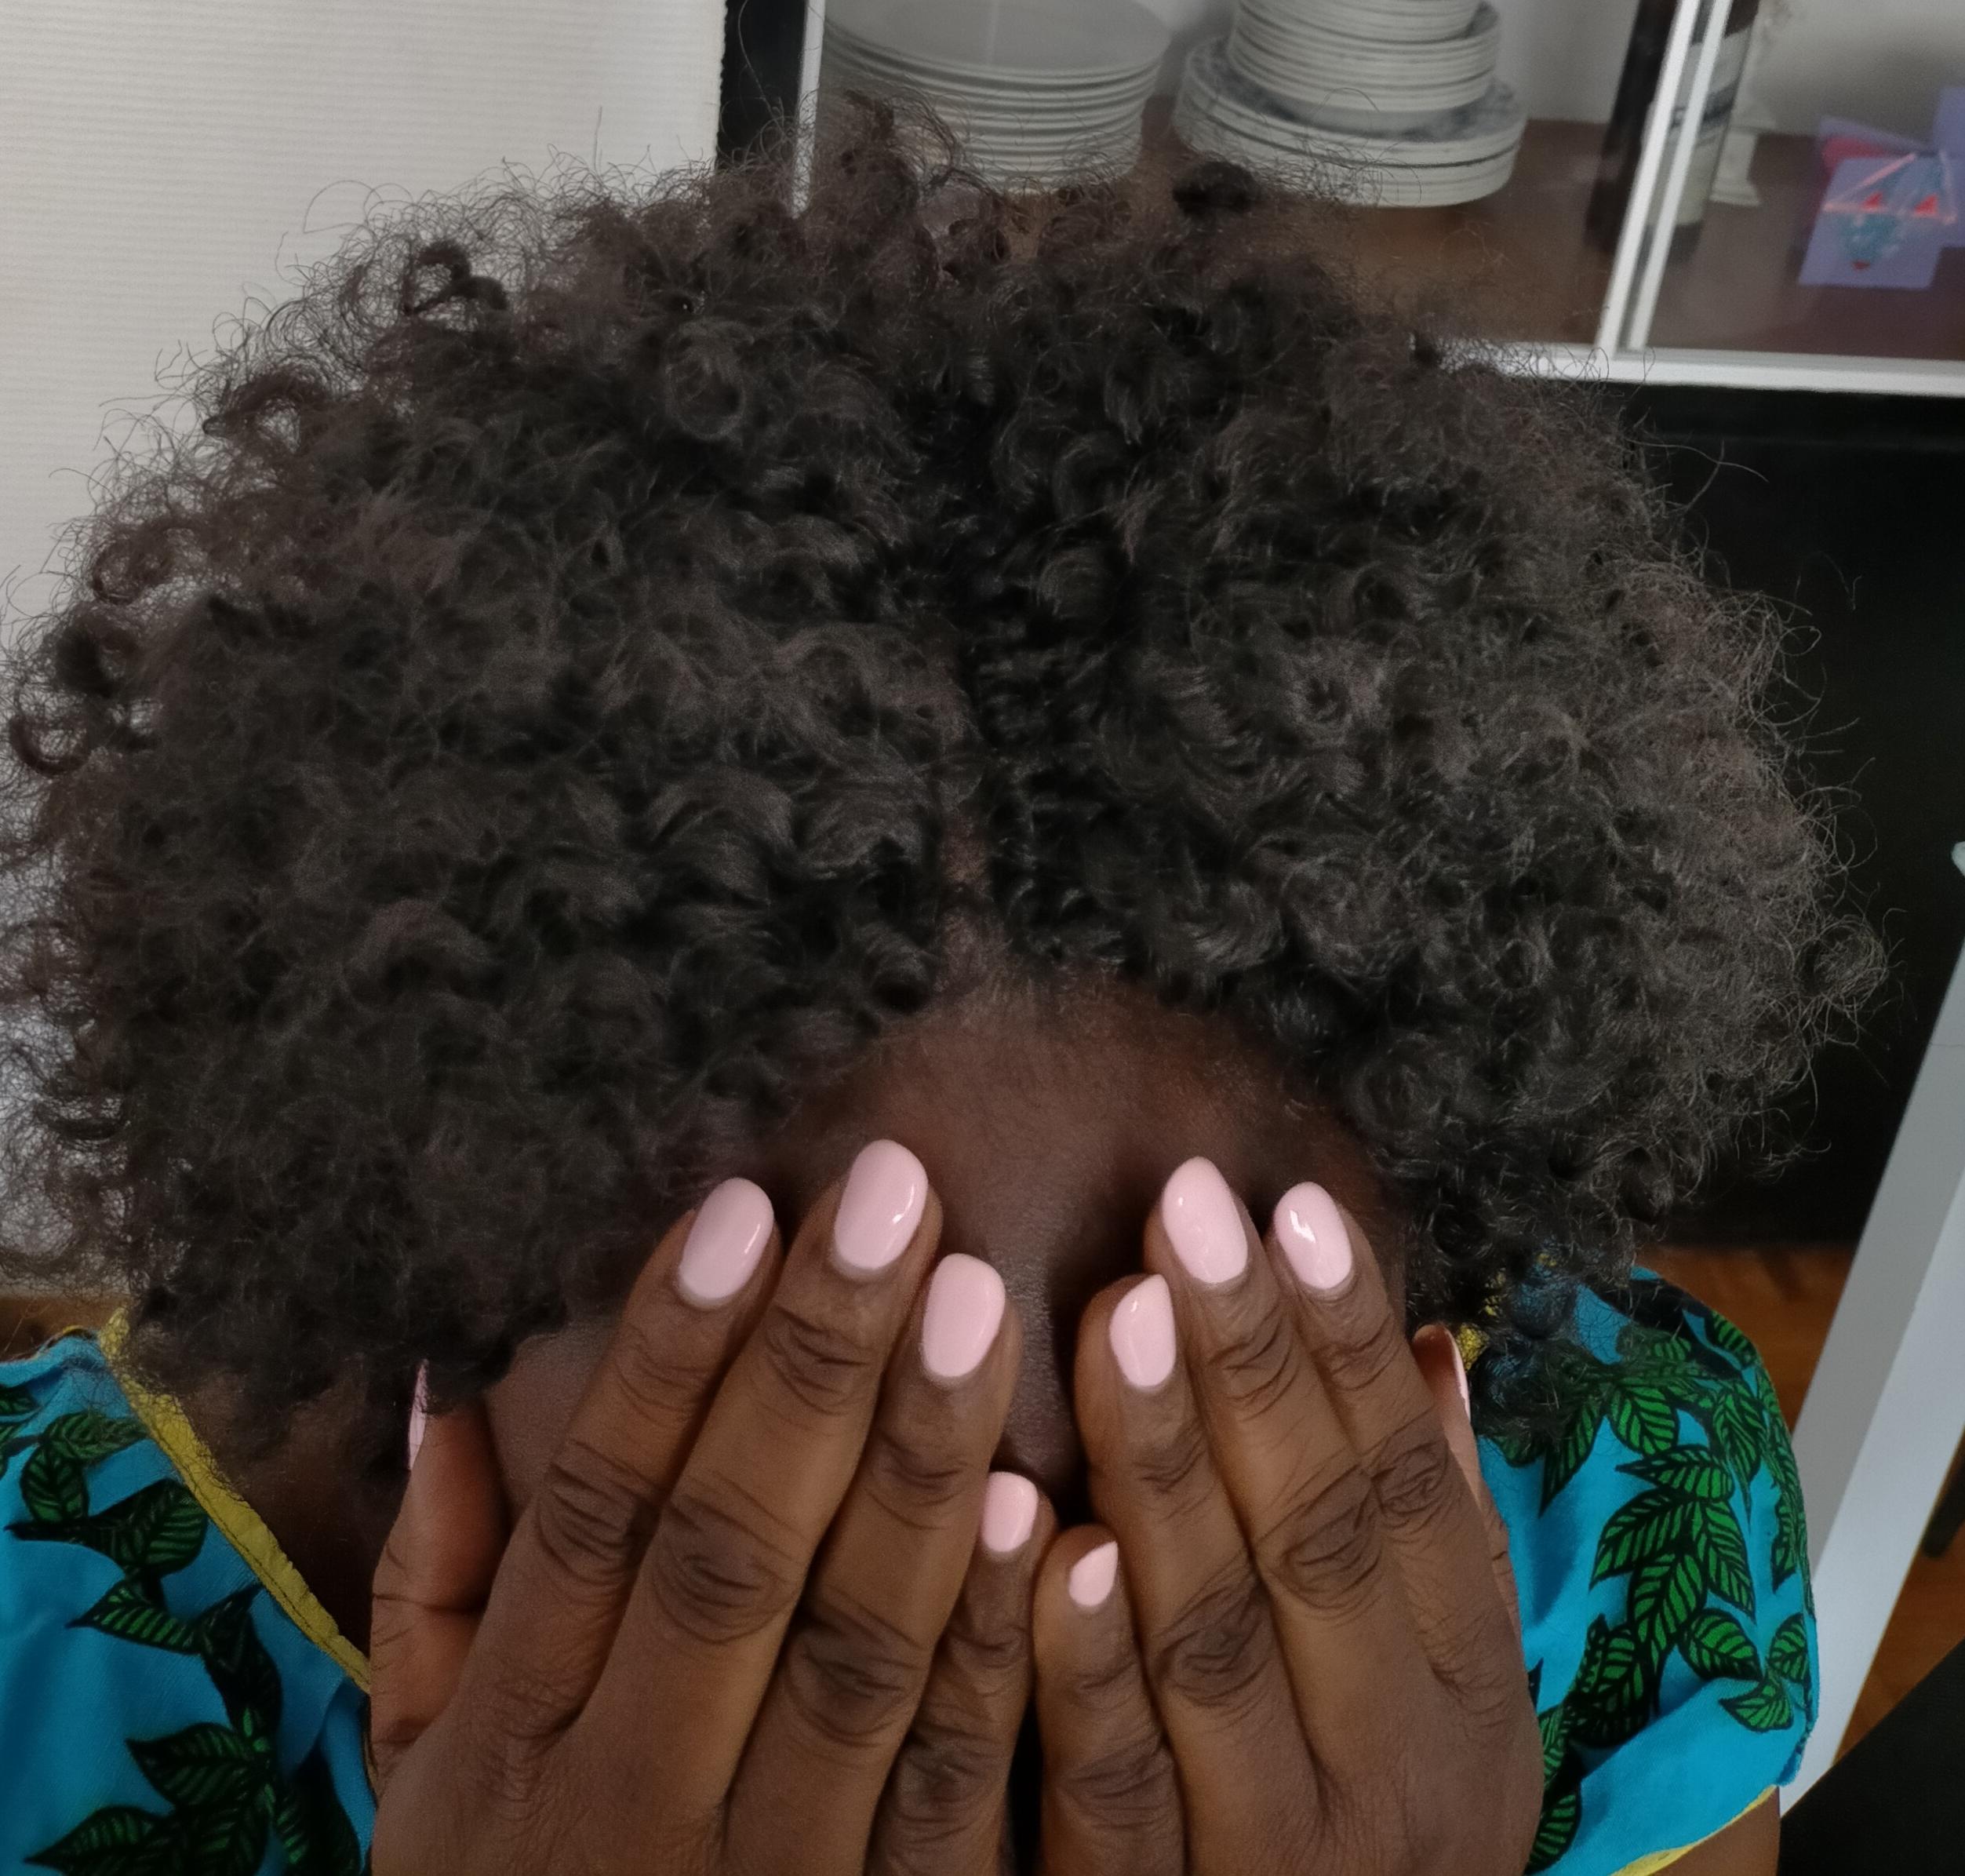 salon de coiffure afro tresse tresses box braids crochet braids vanilles tissages paris 75 77 78 91 92 93 94 95 WNILLKXQ